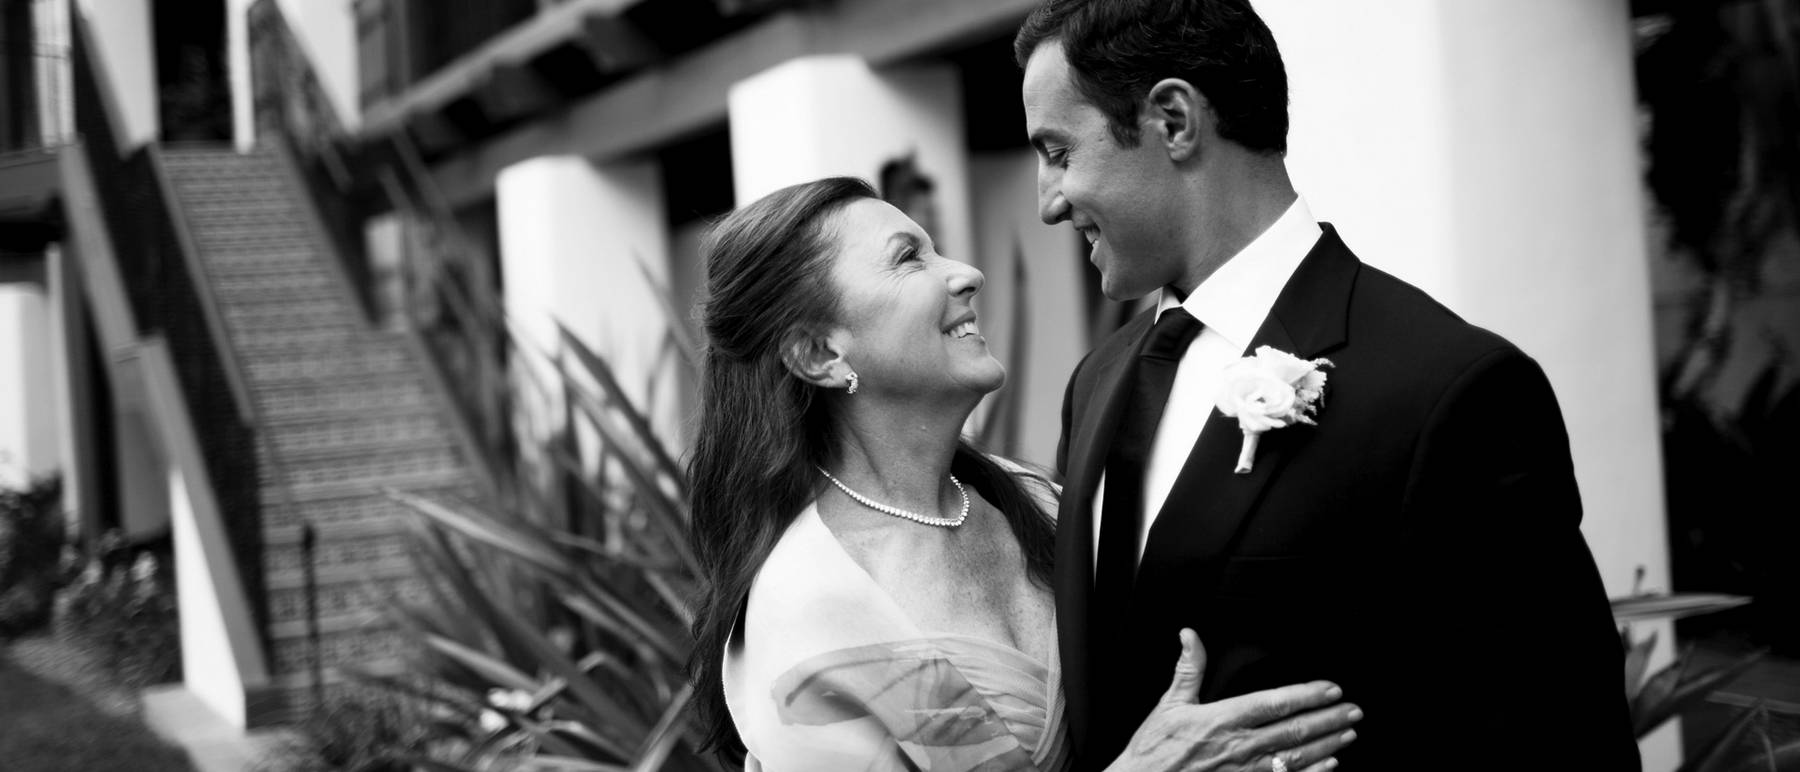 johnandjoseph-wedding-photographer-hz-slider-120